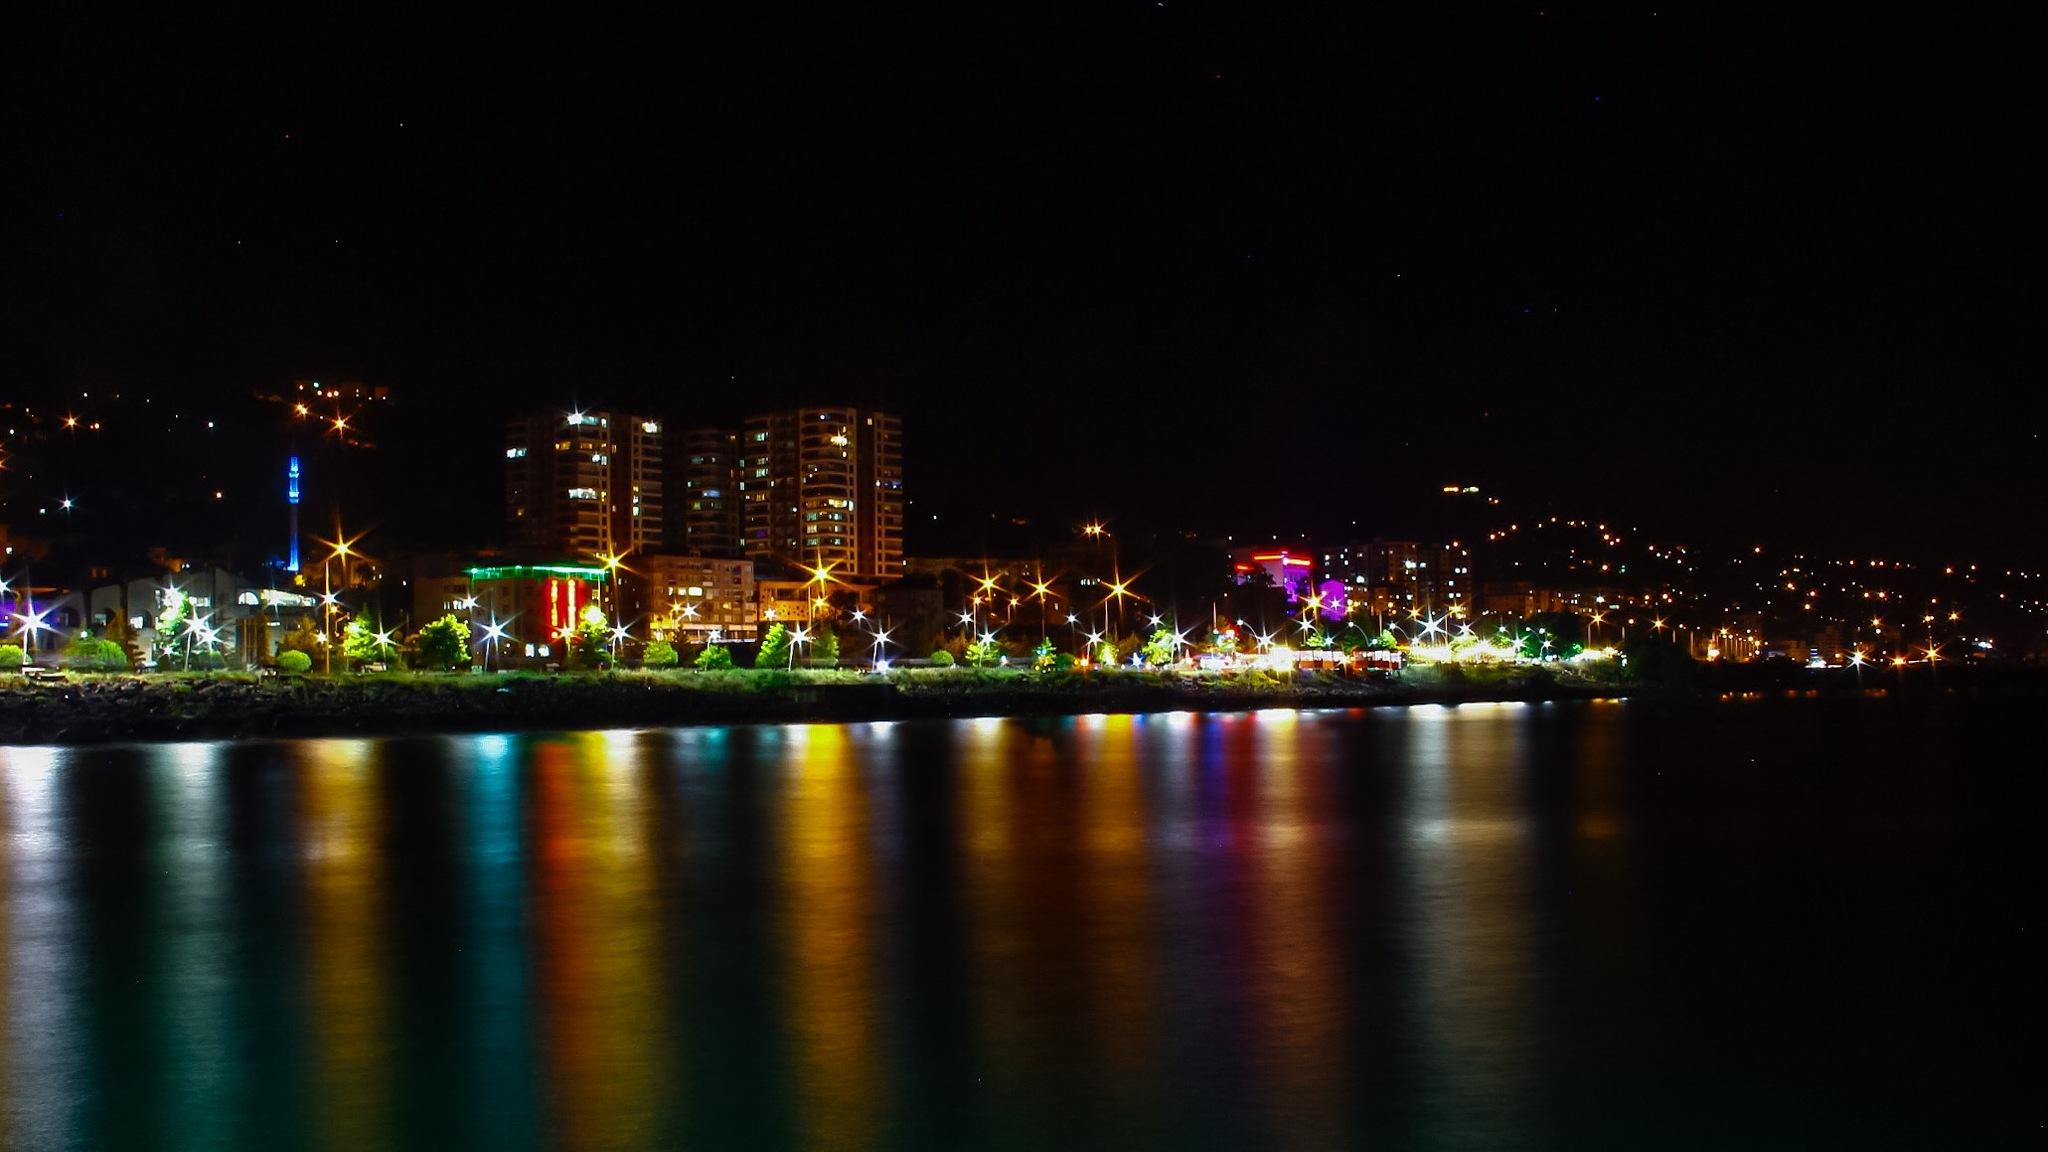 Reflection of the city light  by Oğuzhan Tekbaş